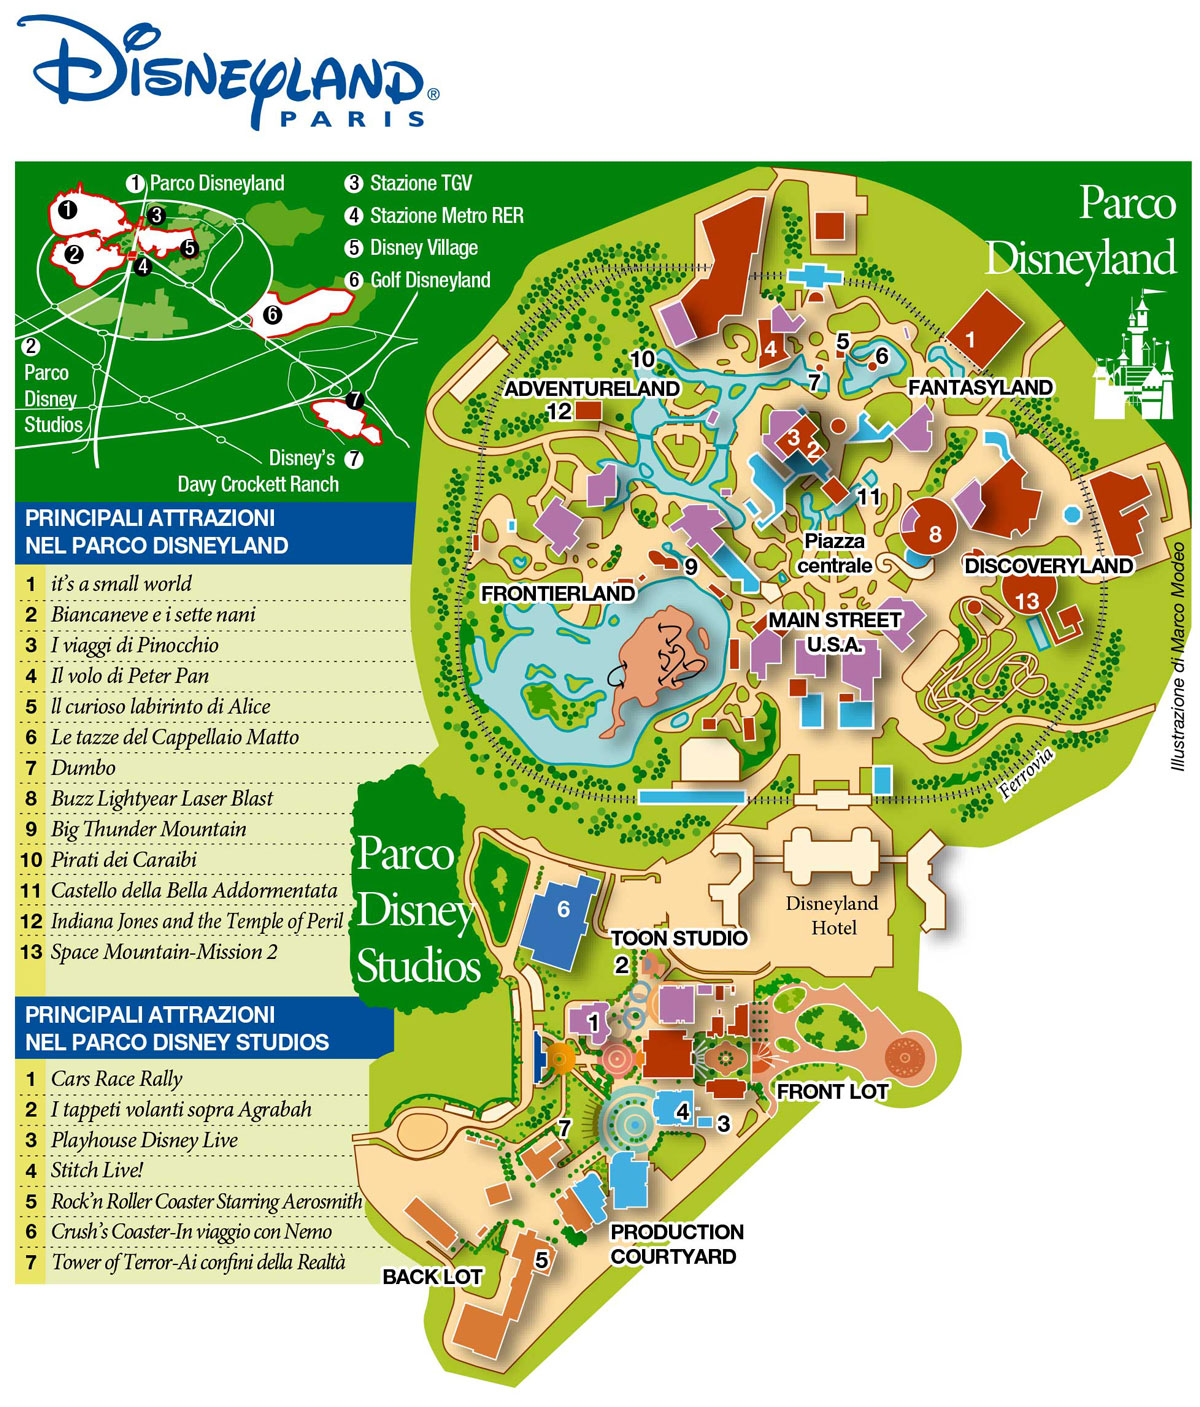 Disneyland Paris Map – MarcoModeo.com